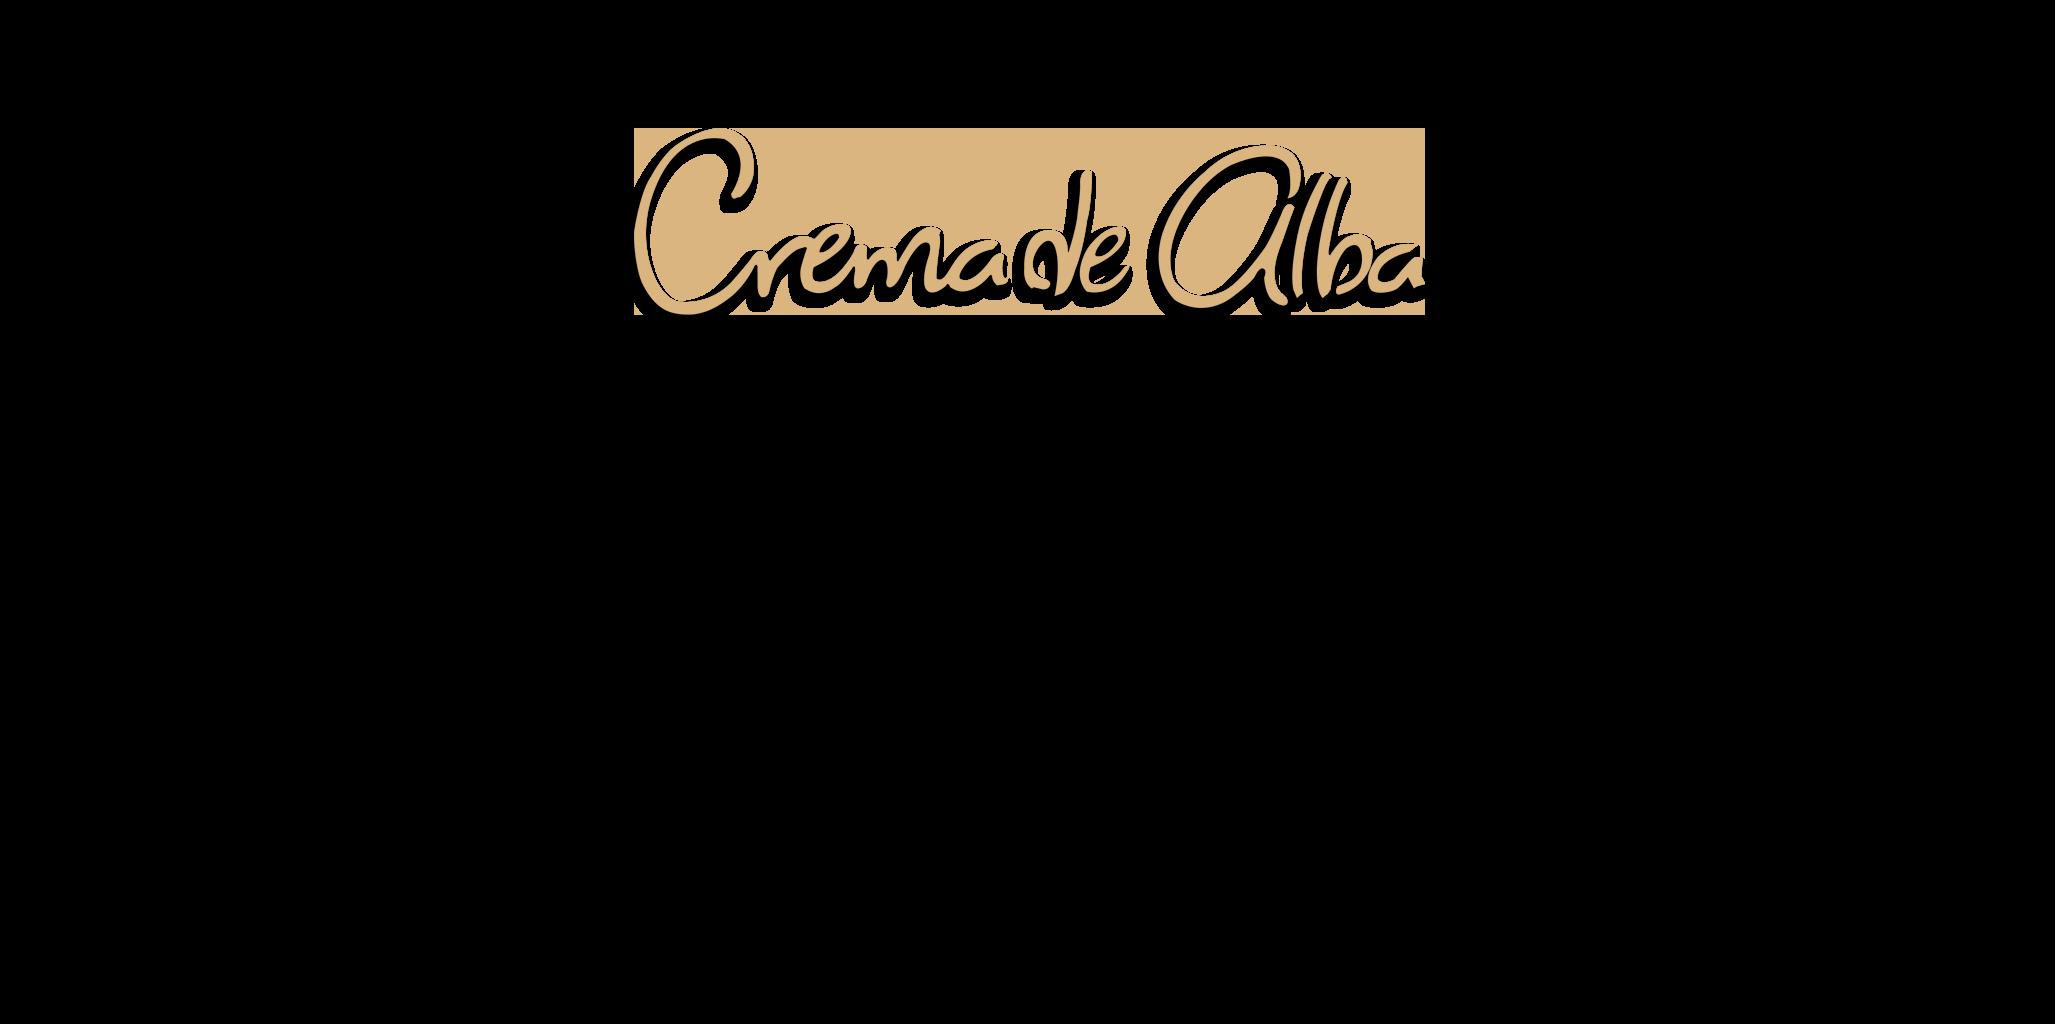 Logo Crema de Alba